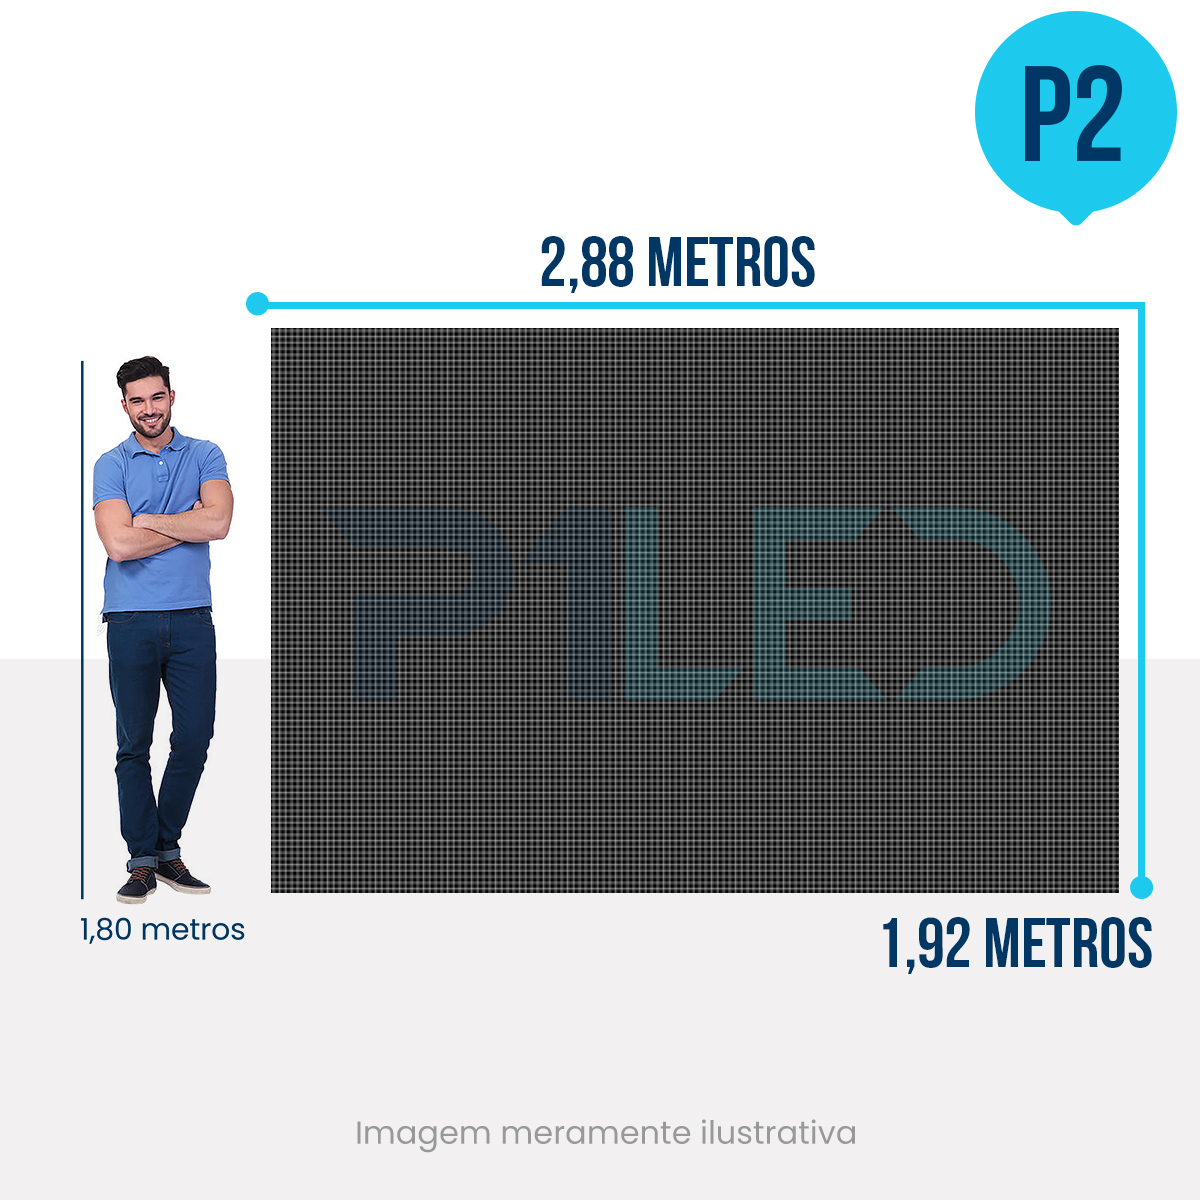 Painel de LED para Padaria 2,88 x 1,92 - Telão P2.9 Indoor  - Painel e Telão de LED - O Melhor Preço em Painel de LED | P1LED